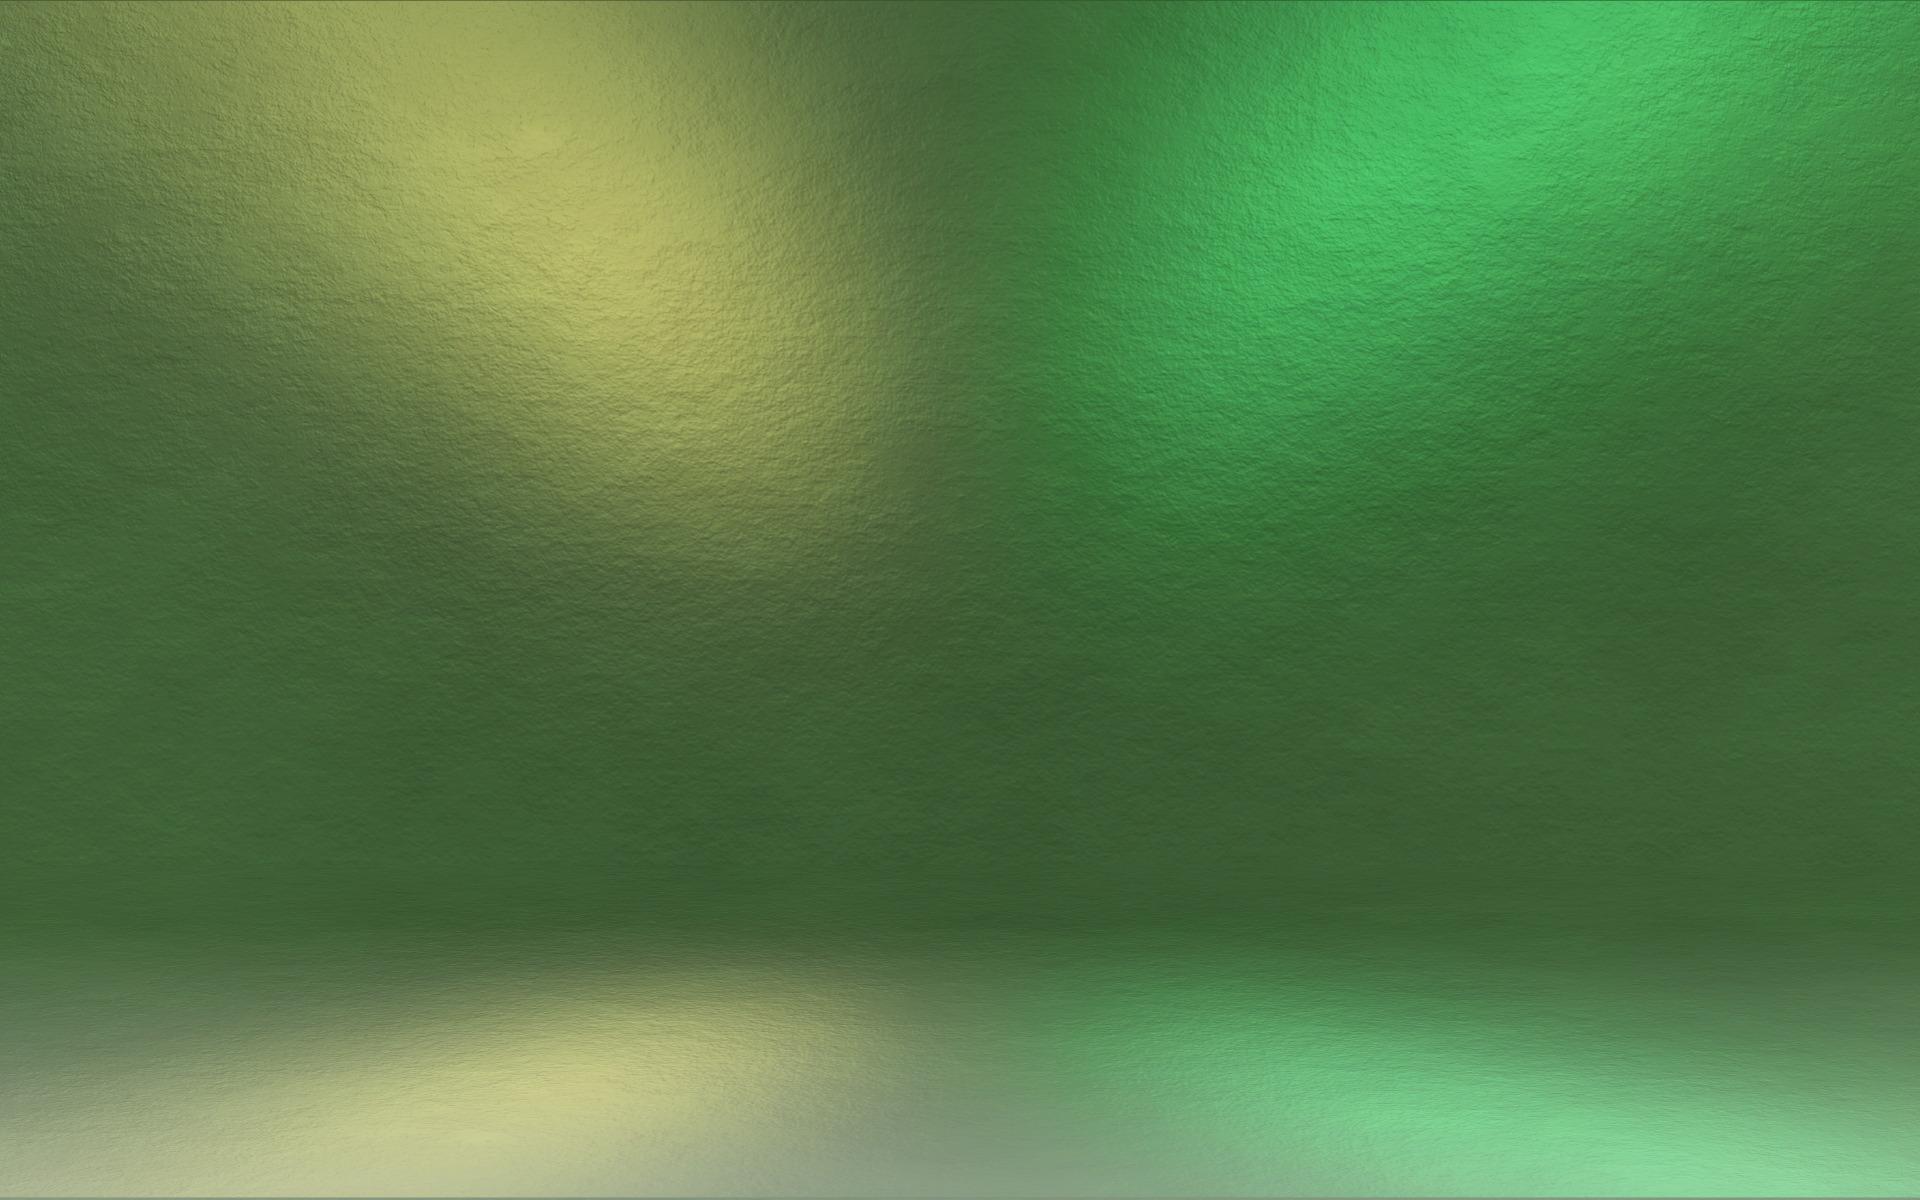 Textura abstracta en verde - 1920x1200